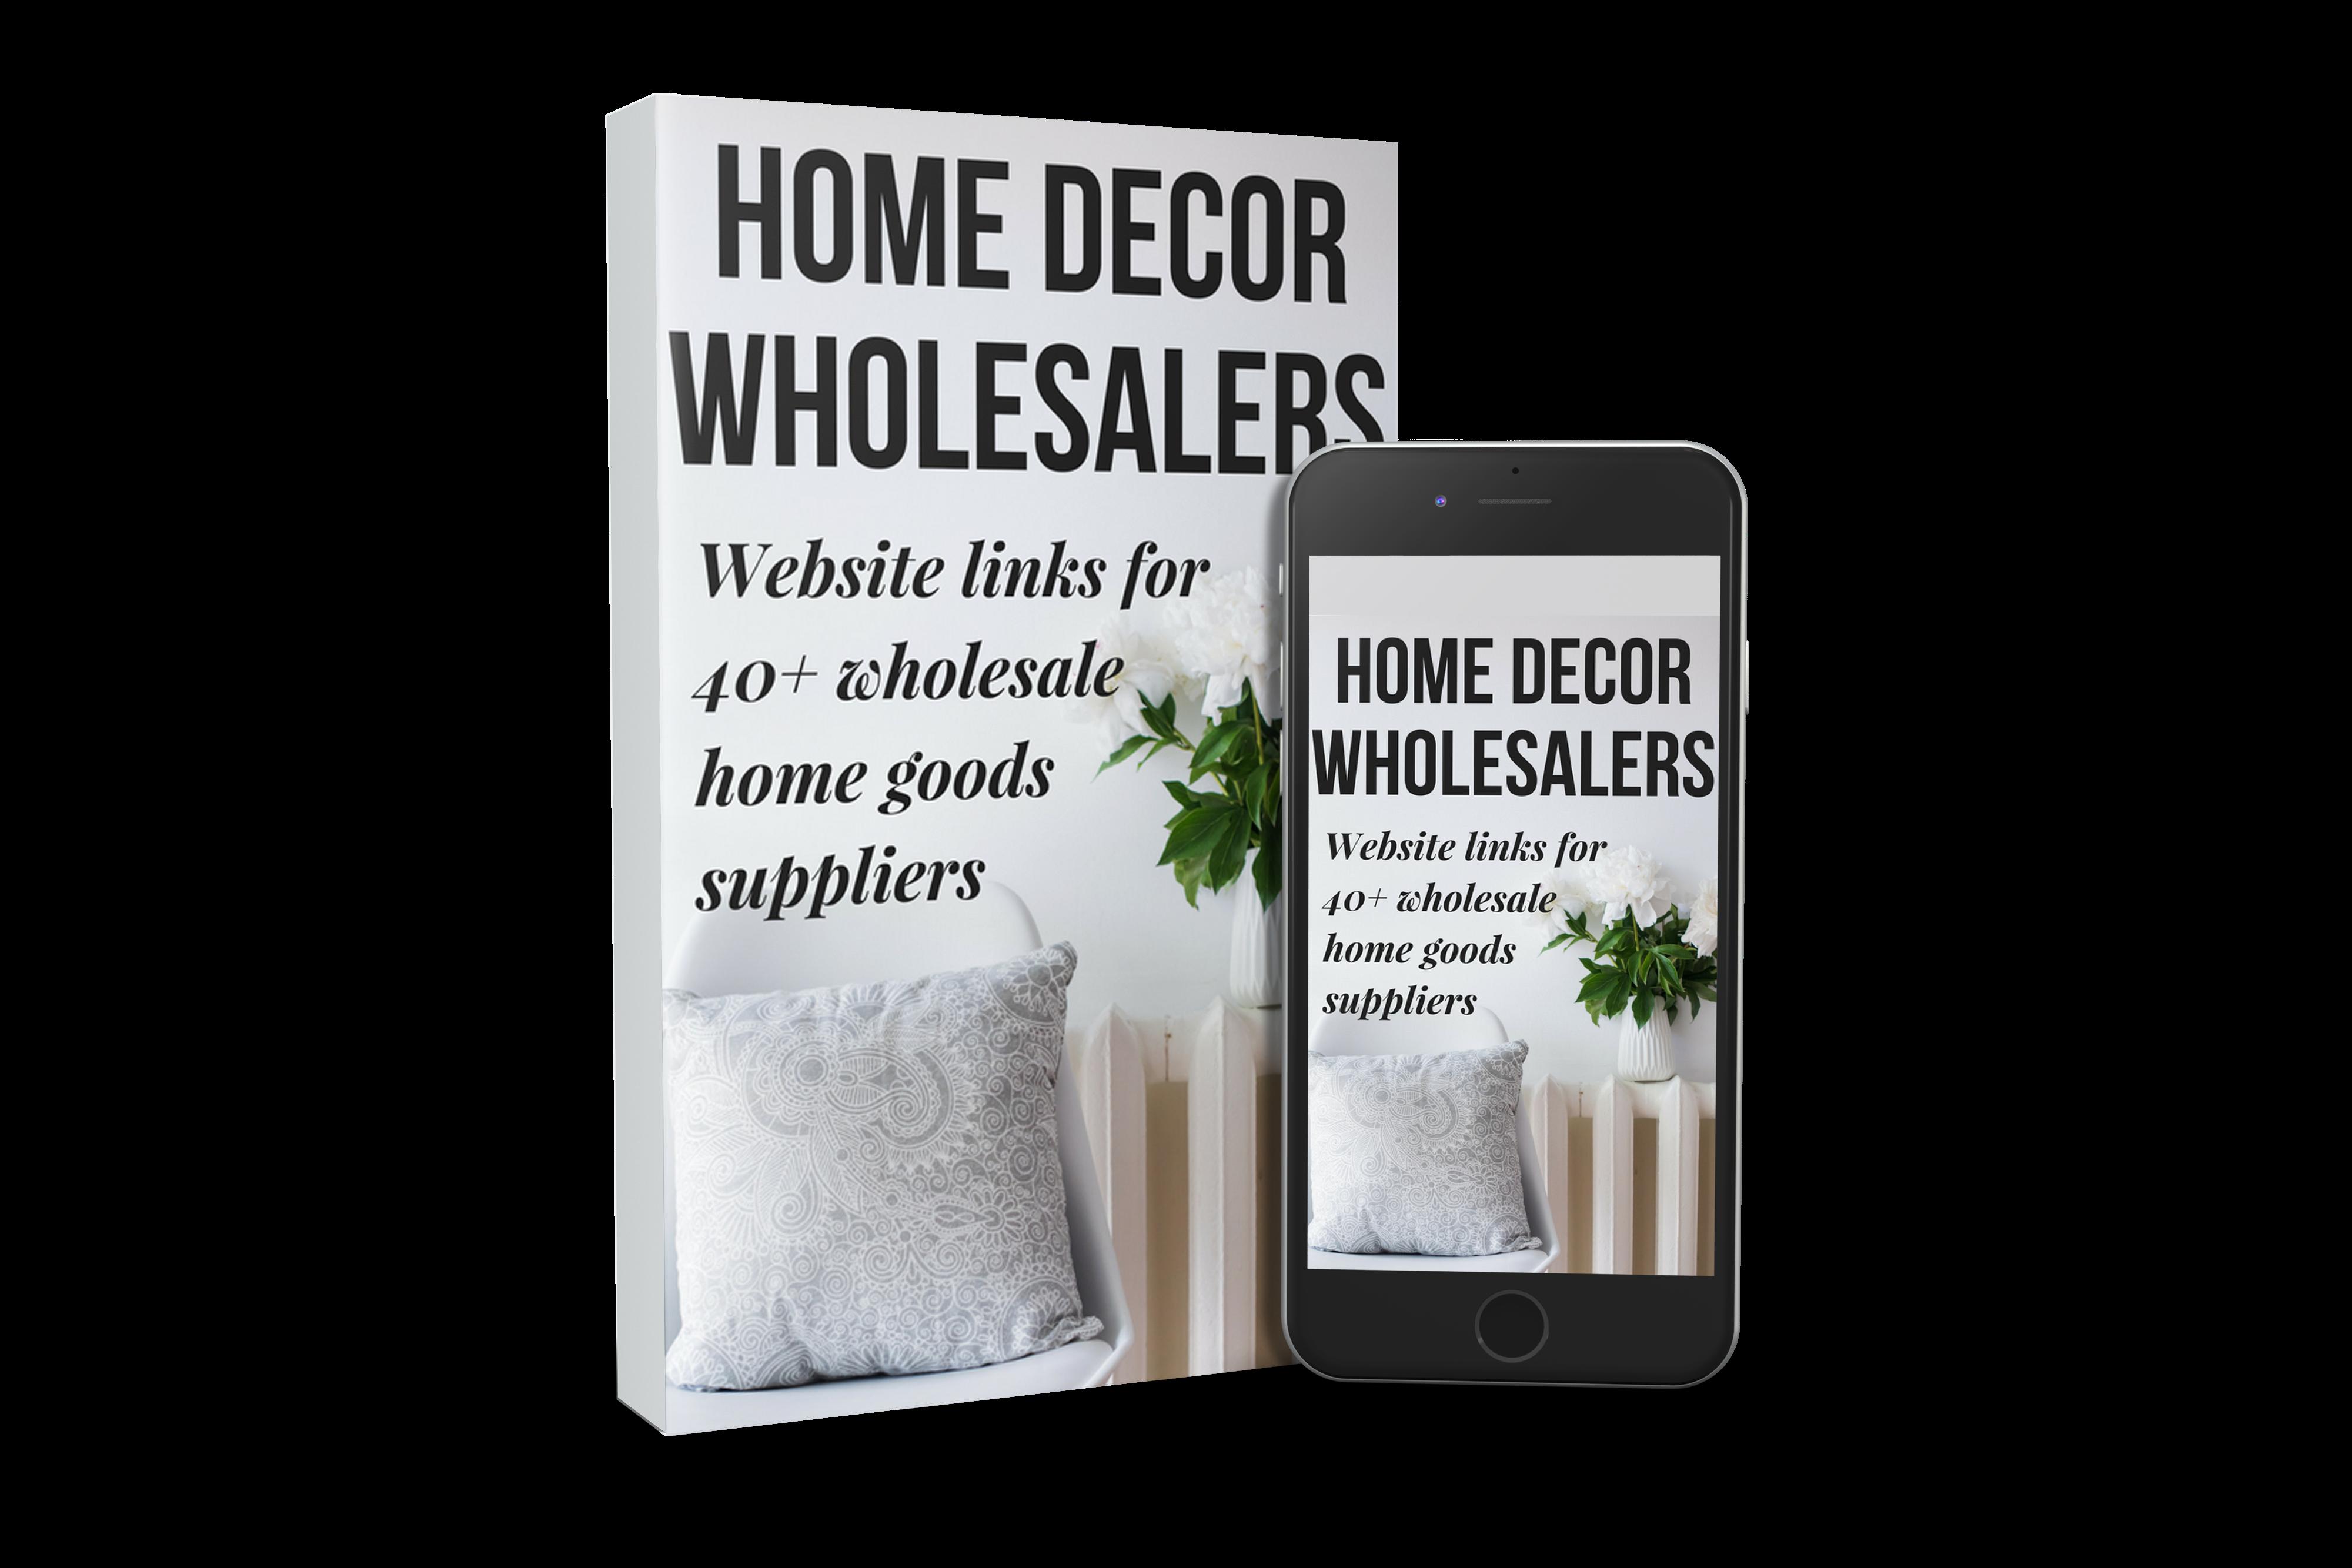 Home Decor Wholesaler List